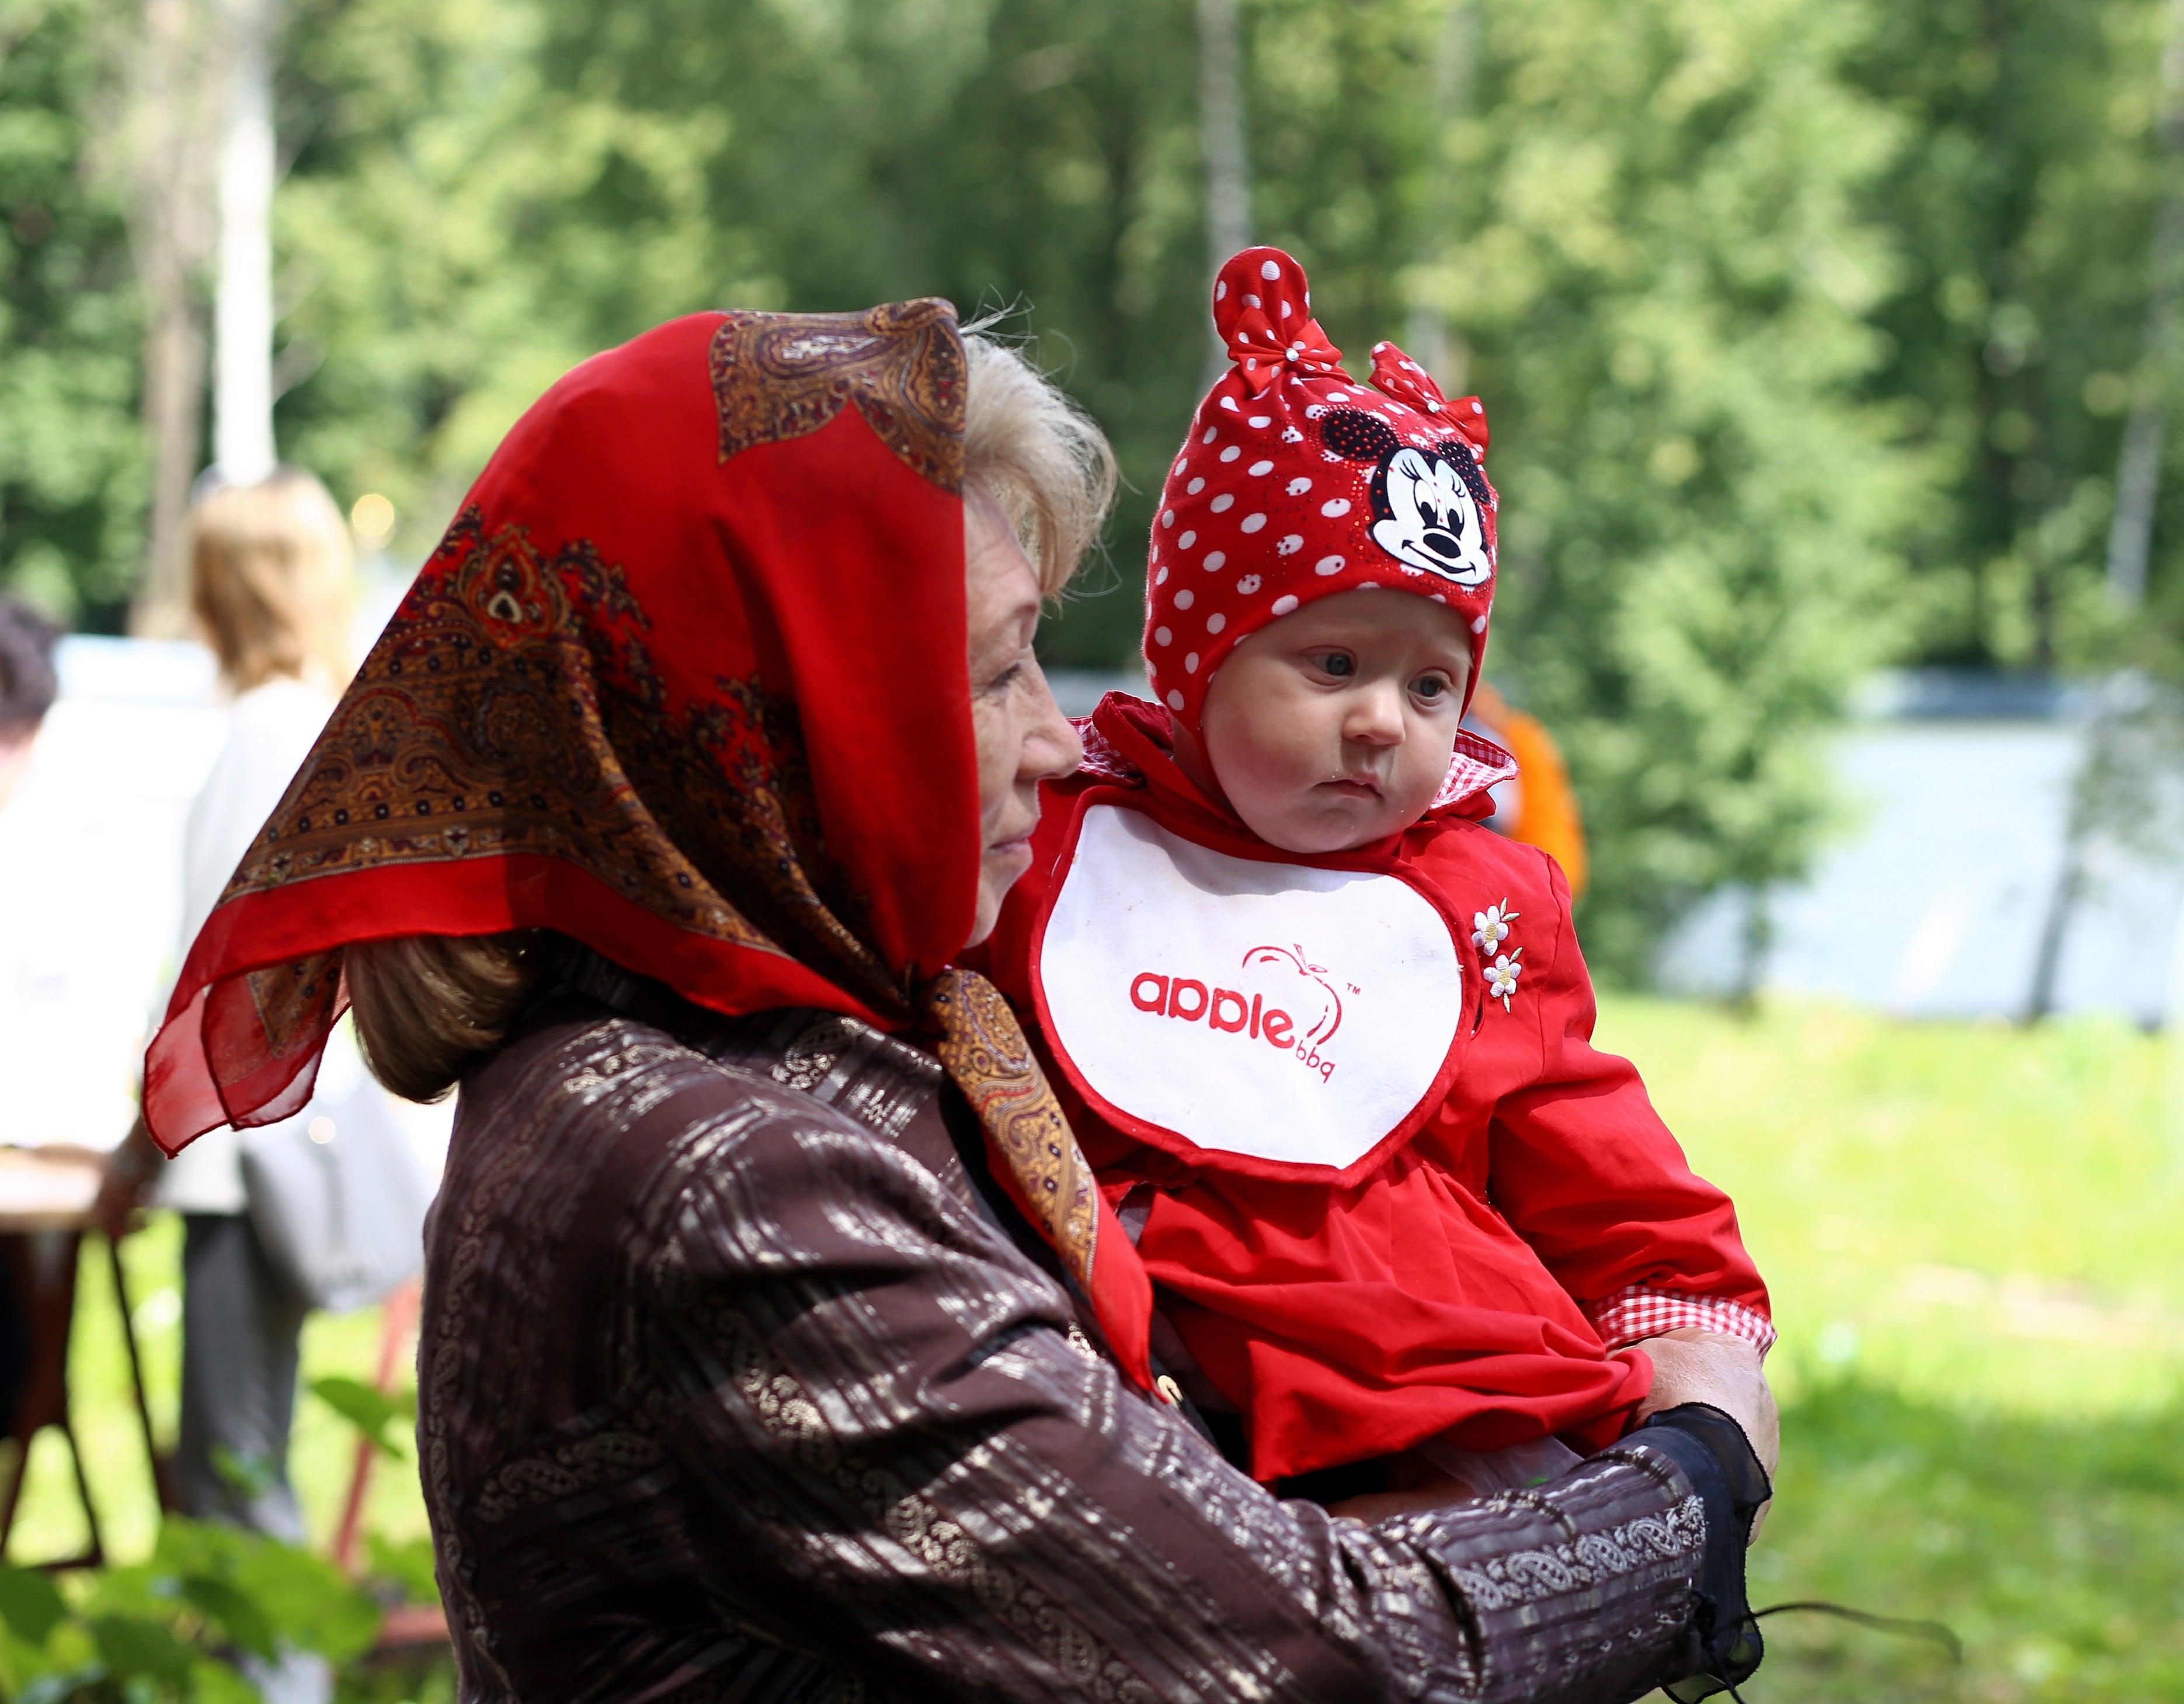 http://monuspen.ru/photoreports/14b72a43bf568736ebc953d1a903f339.jpg